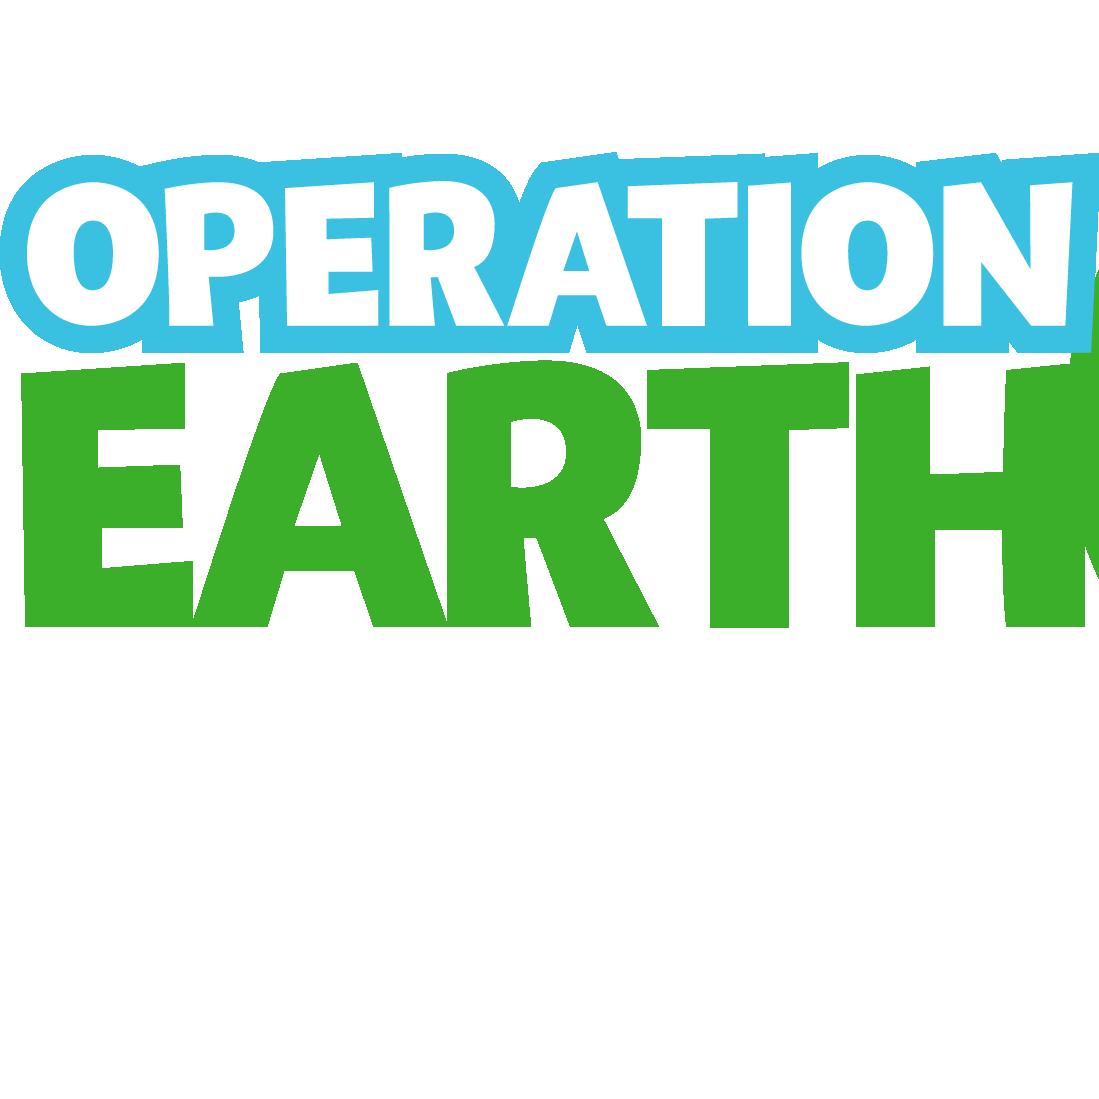 Operation Earth